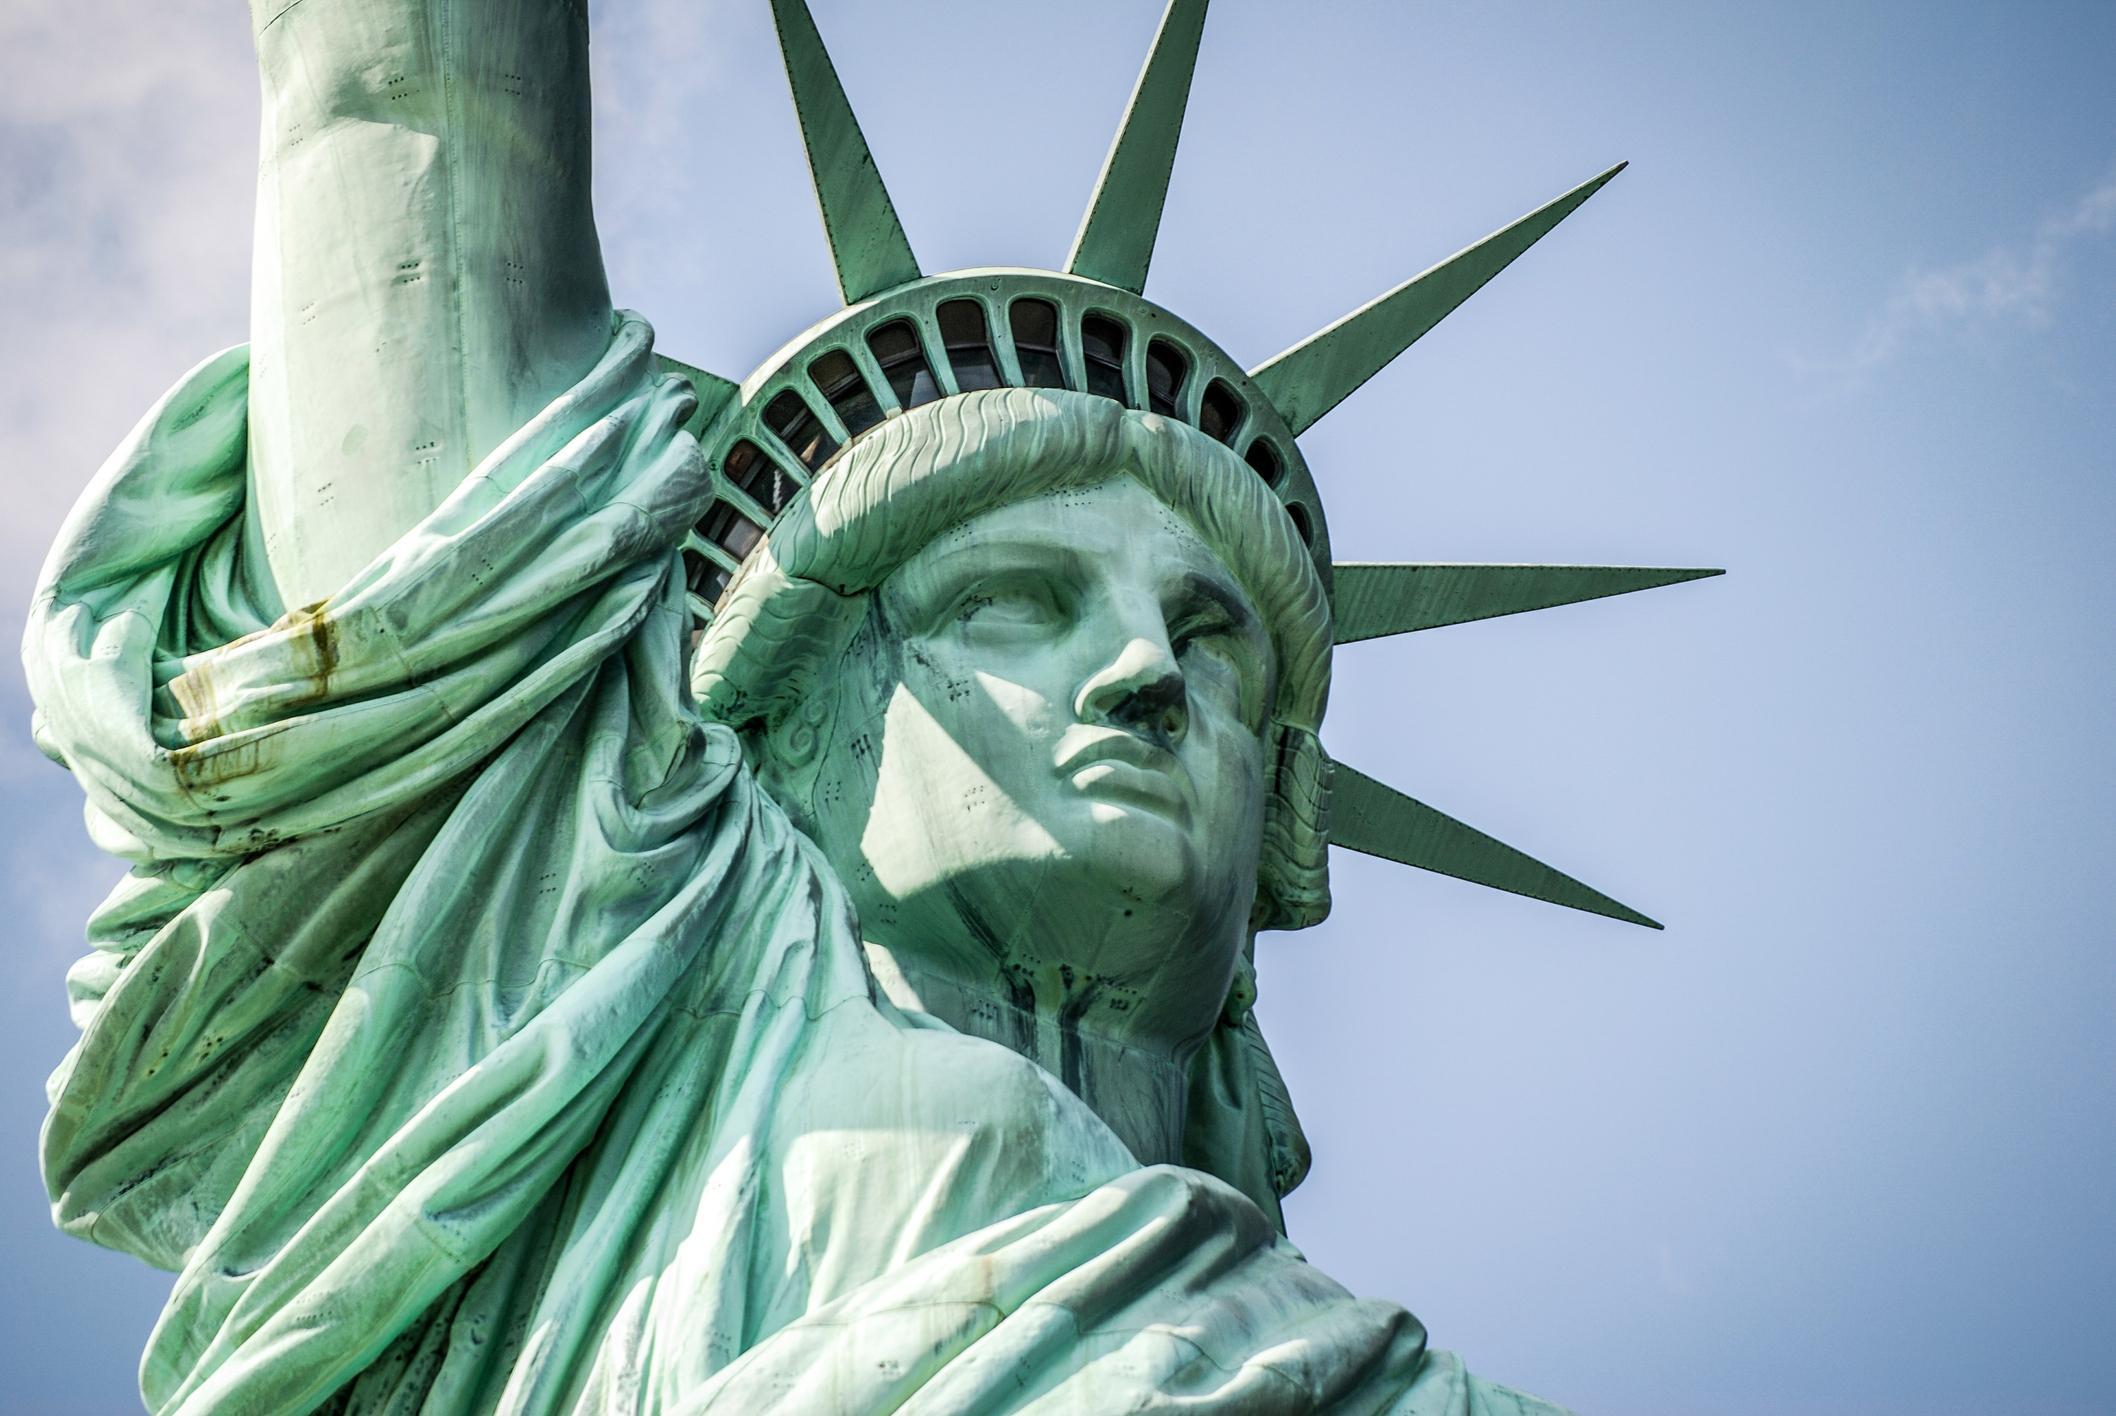 2-statue-of-liberty-1563893422735.jpg